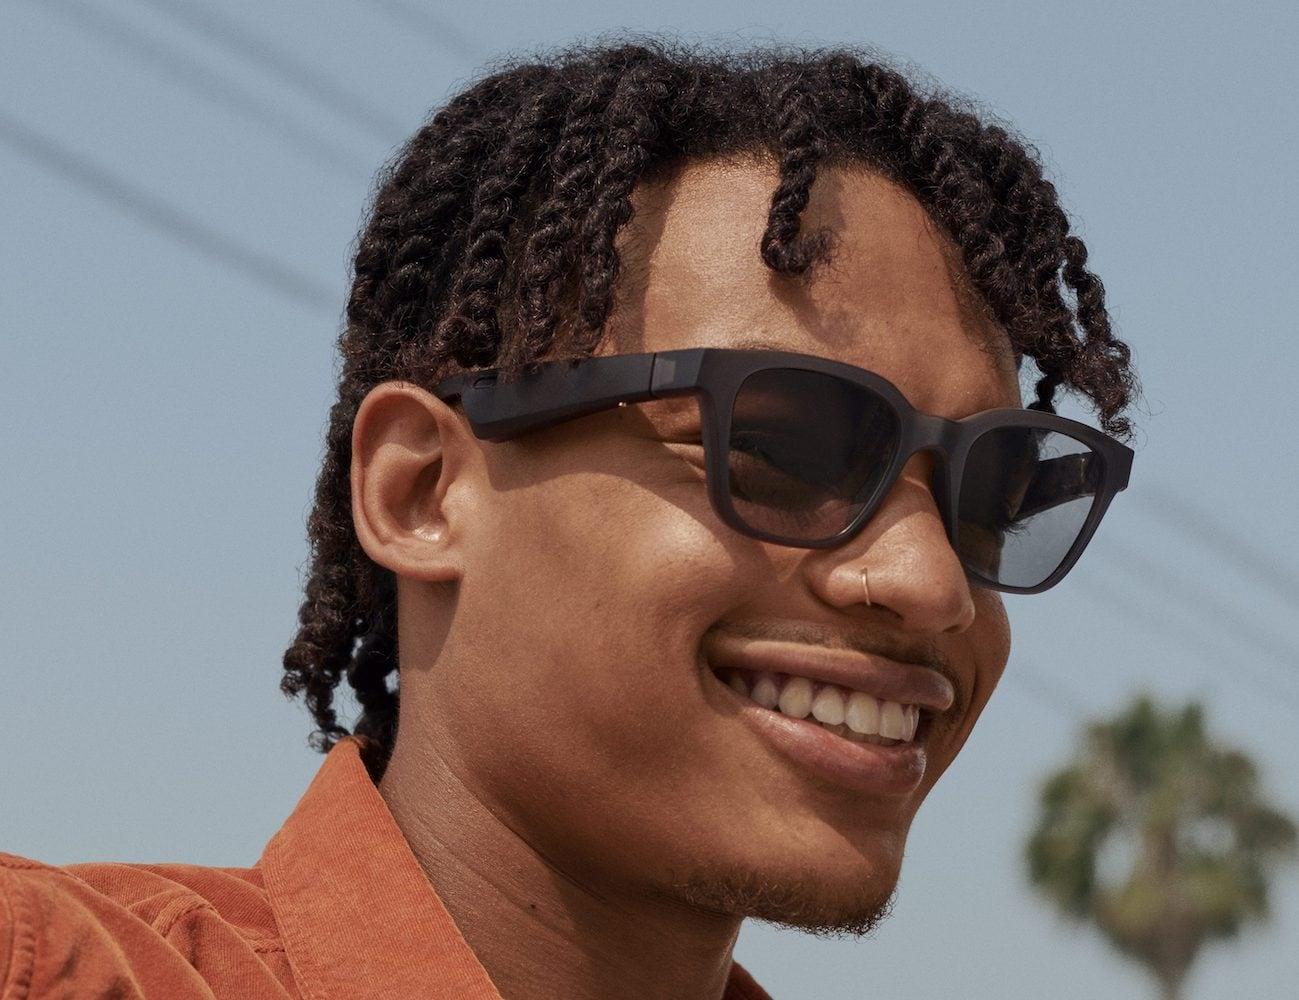 Bose Frames Rondo Audio Sunglasses have mini speakers near your ears